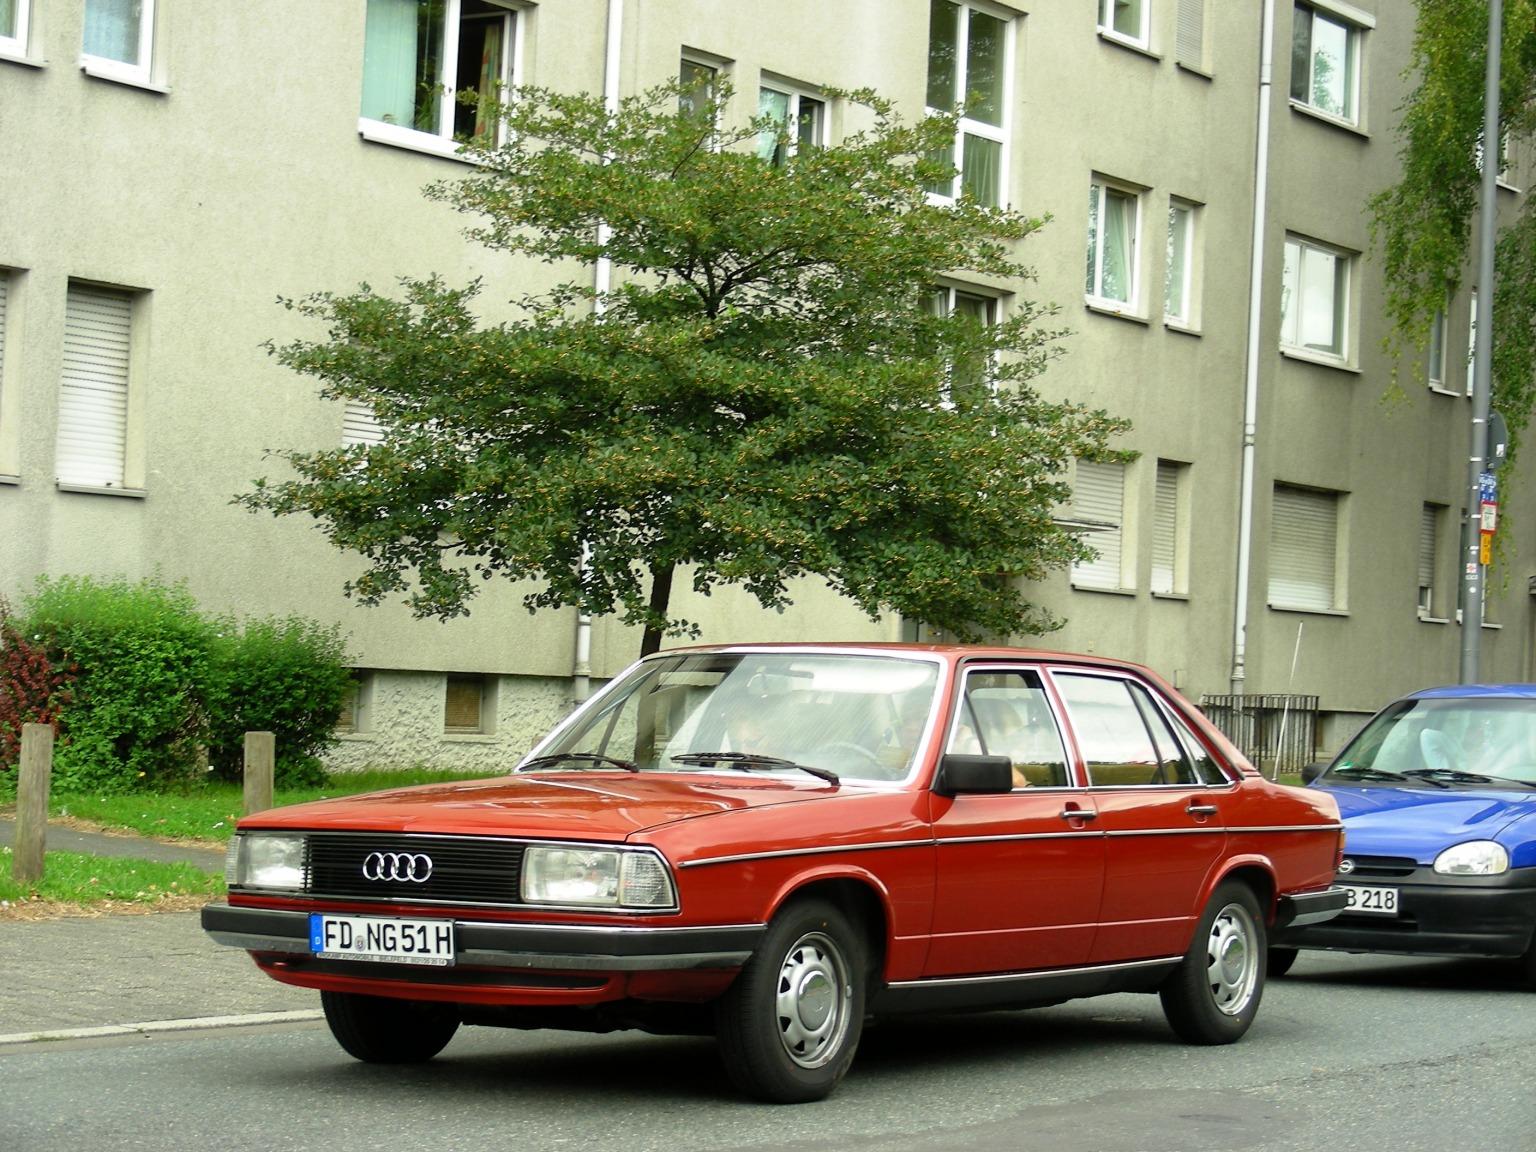 Audi 100 1980 img01